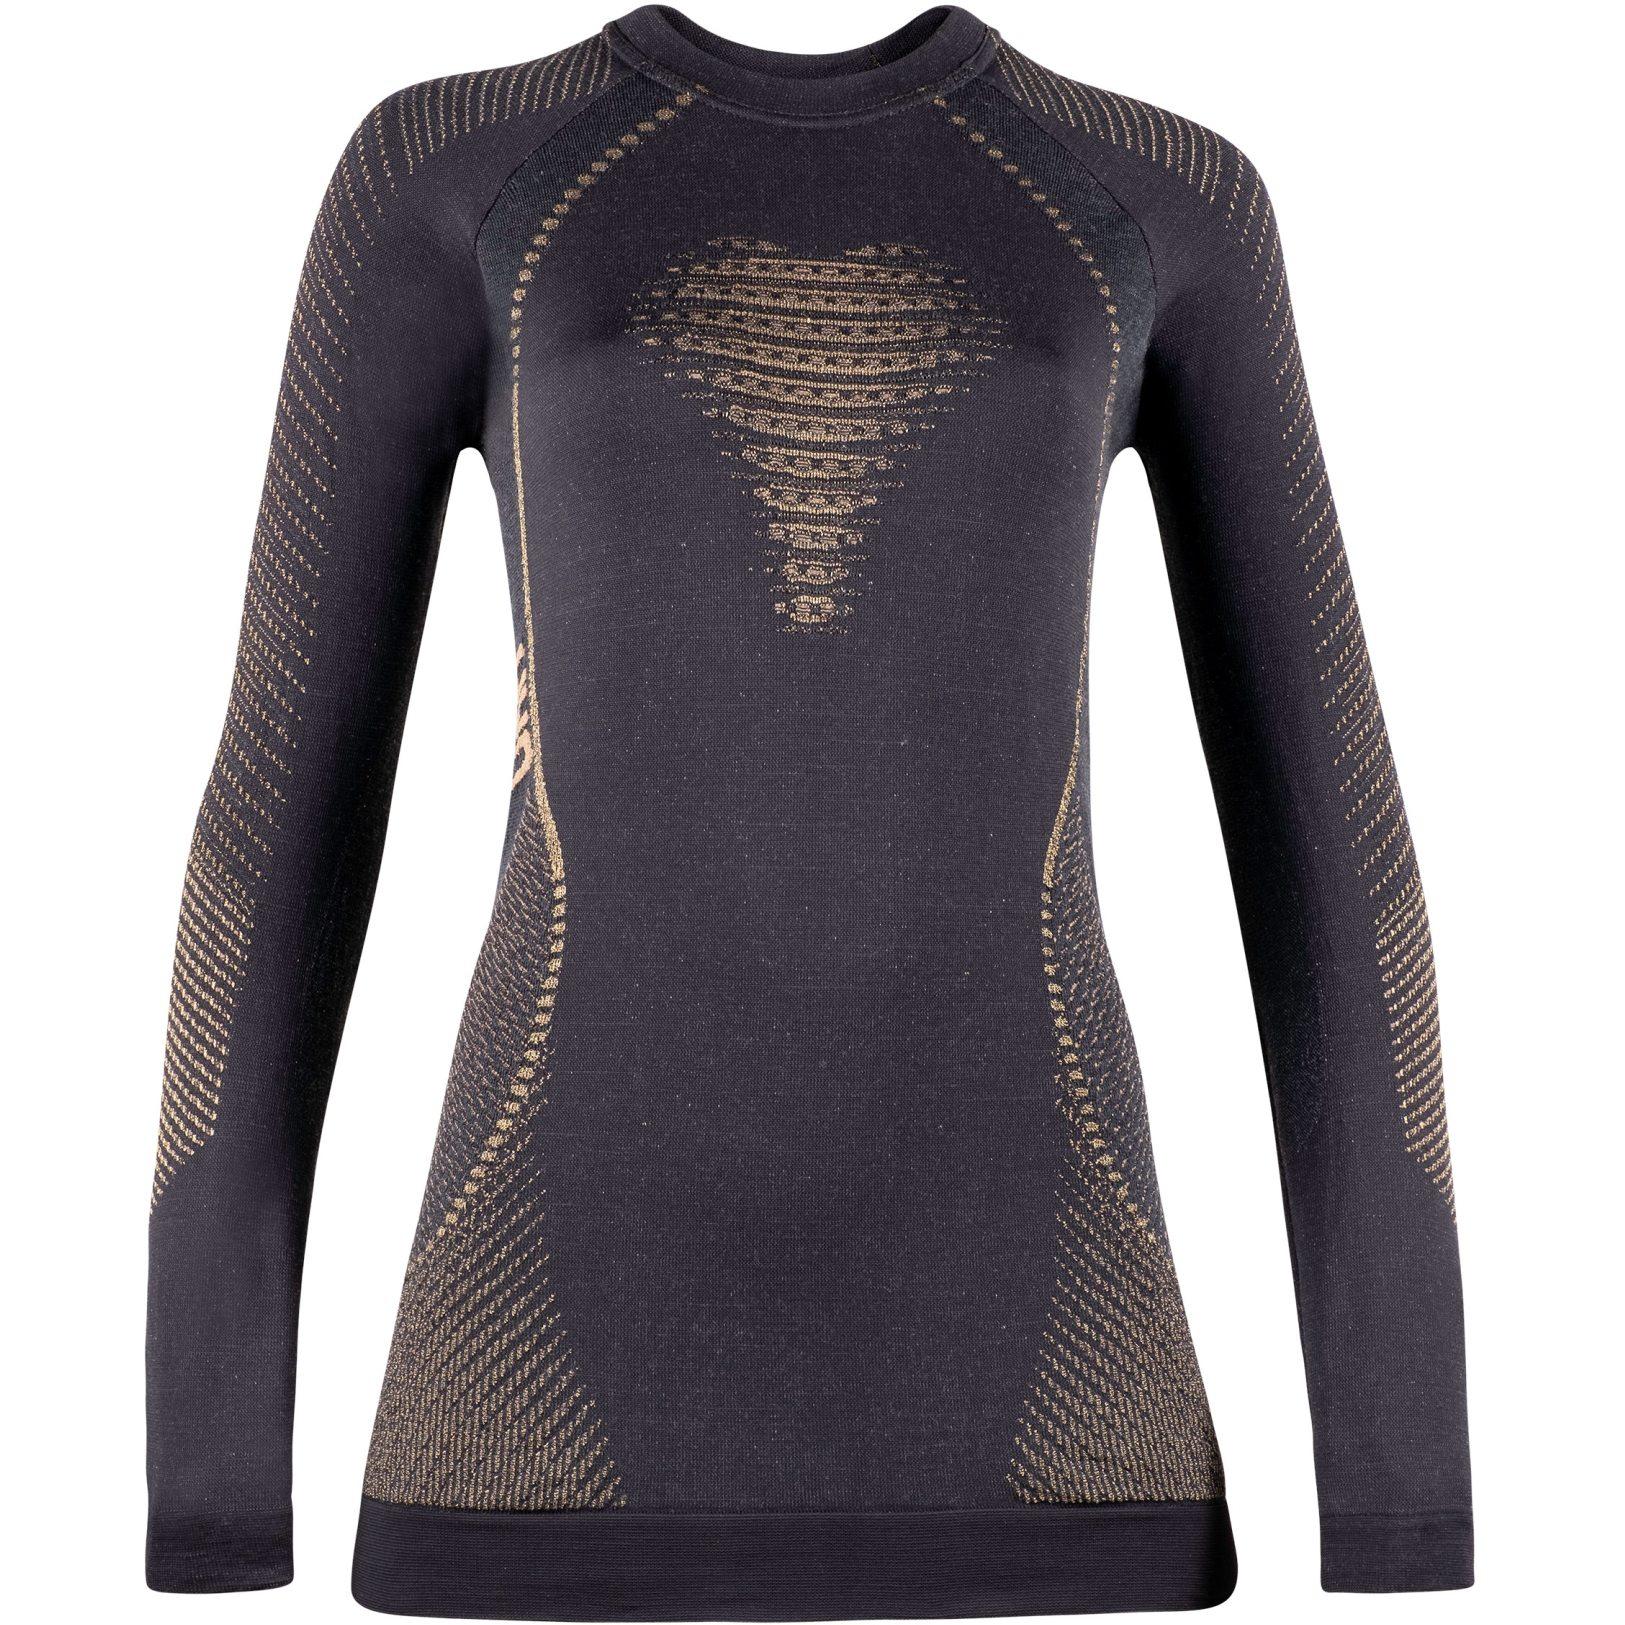 UYN Cashmere Shiny 2.0 Underwear Langarmshirt Damen - Celebrity Gold